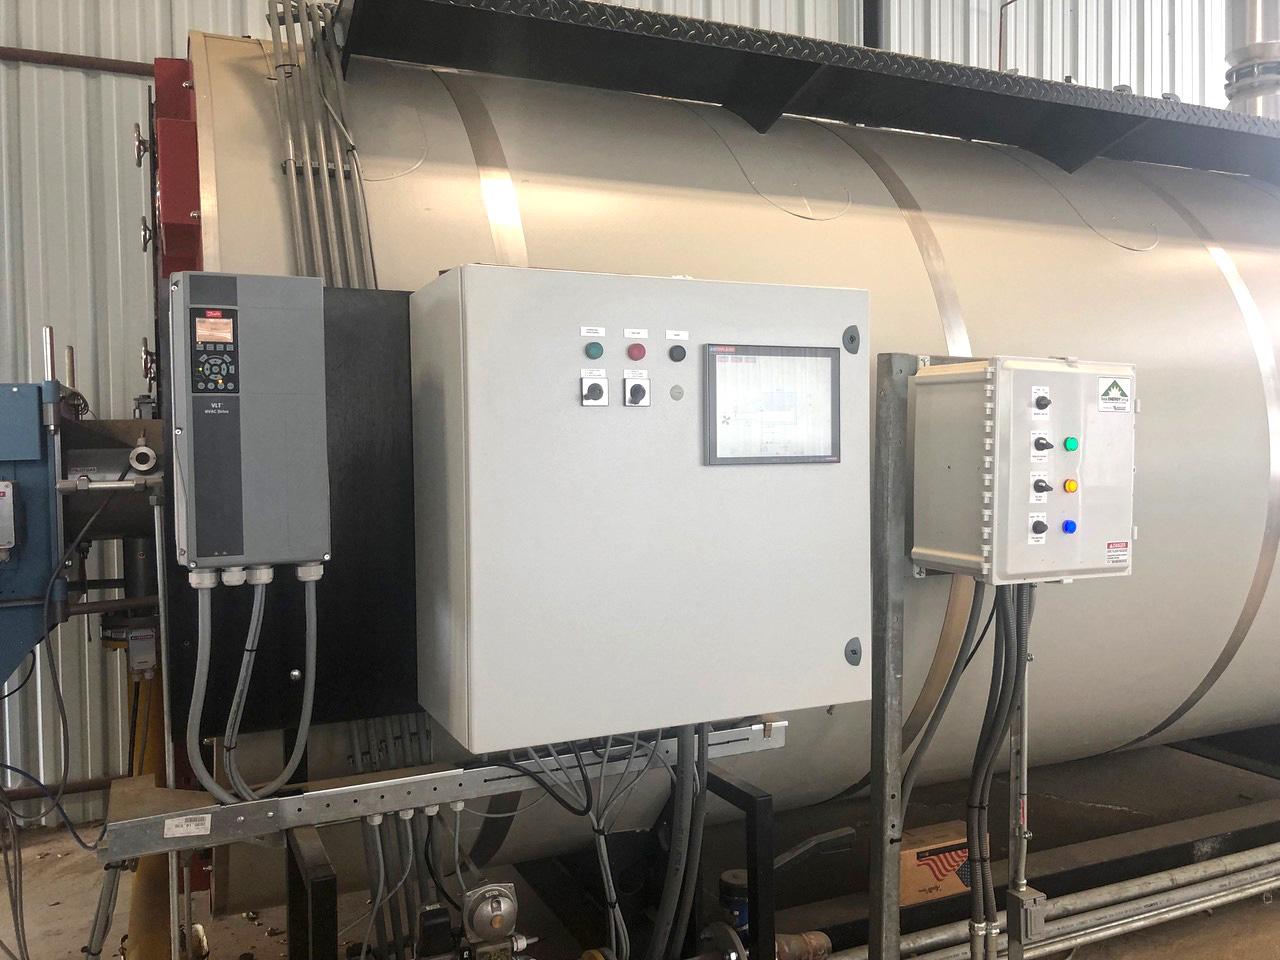 Controller and Boiler